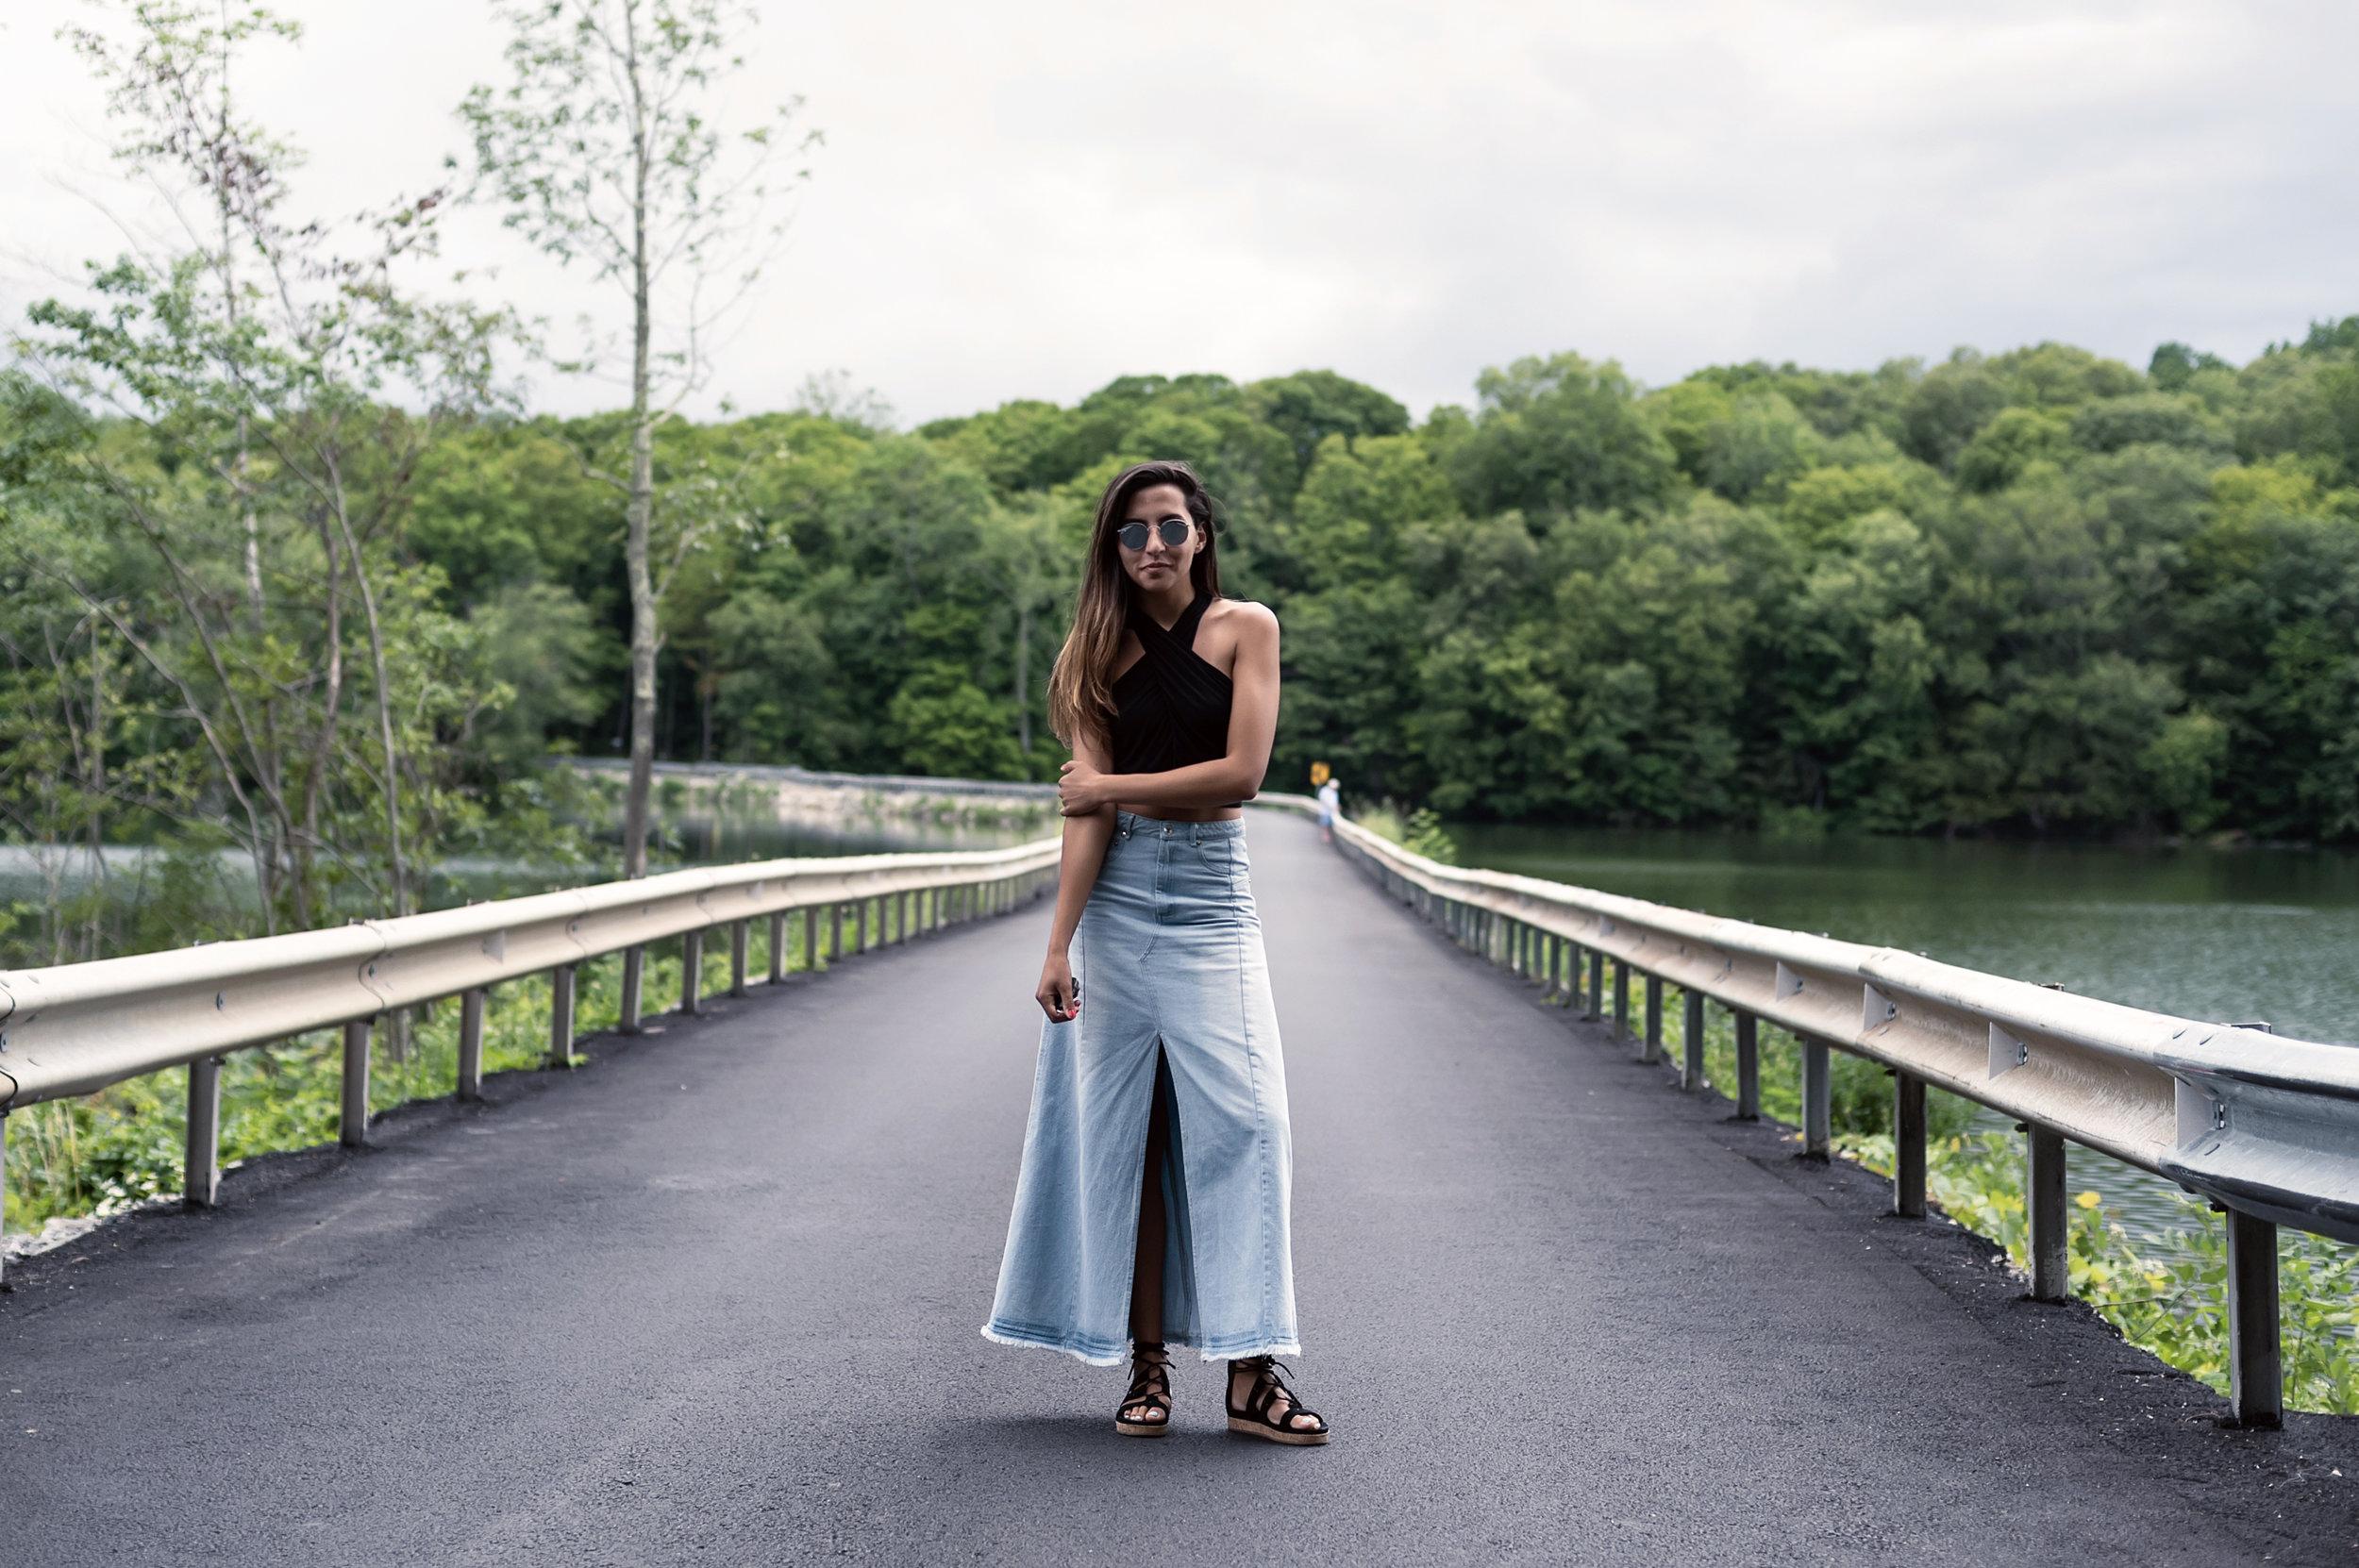 fashion-blogger-raquel-paiva-no-museu-dia-beacon-em-ny